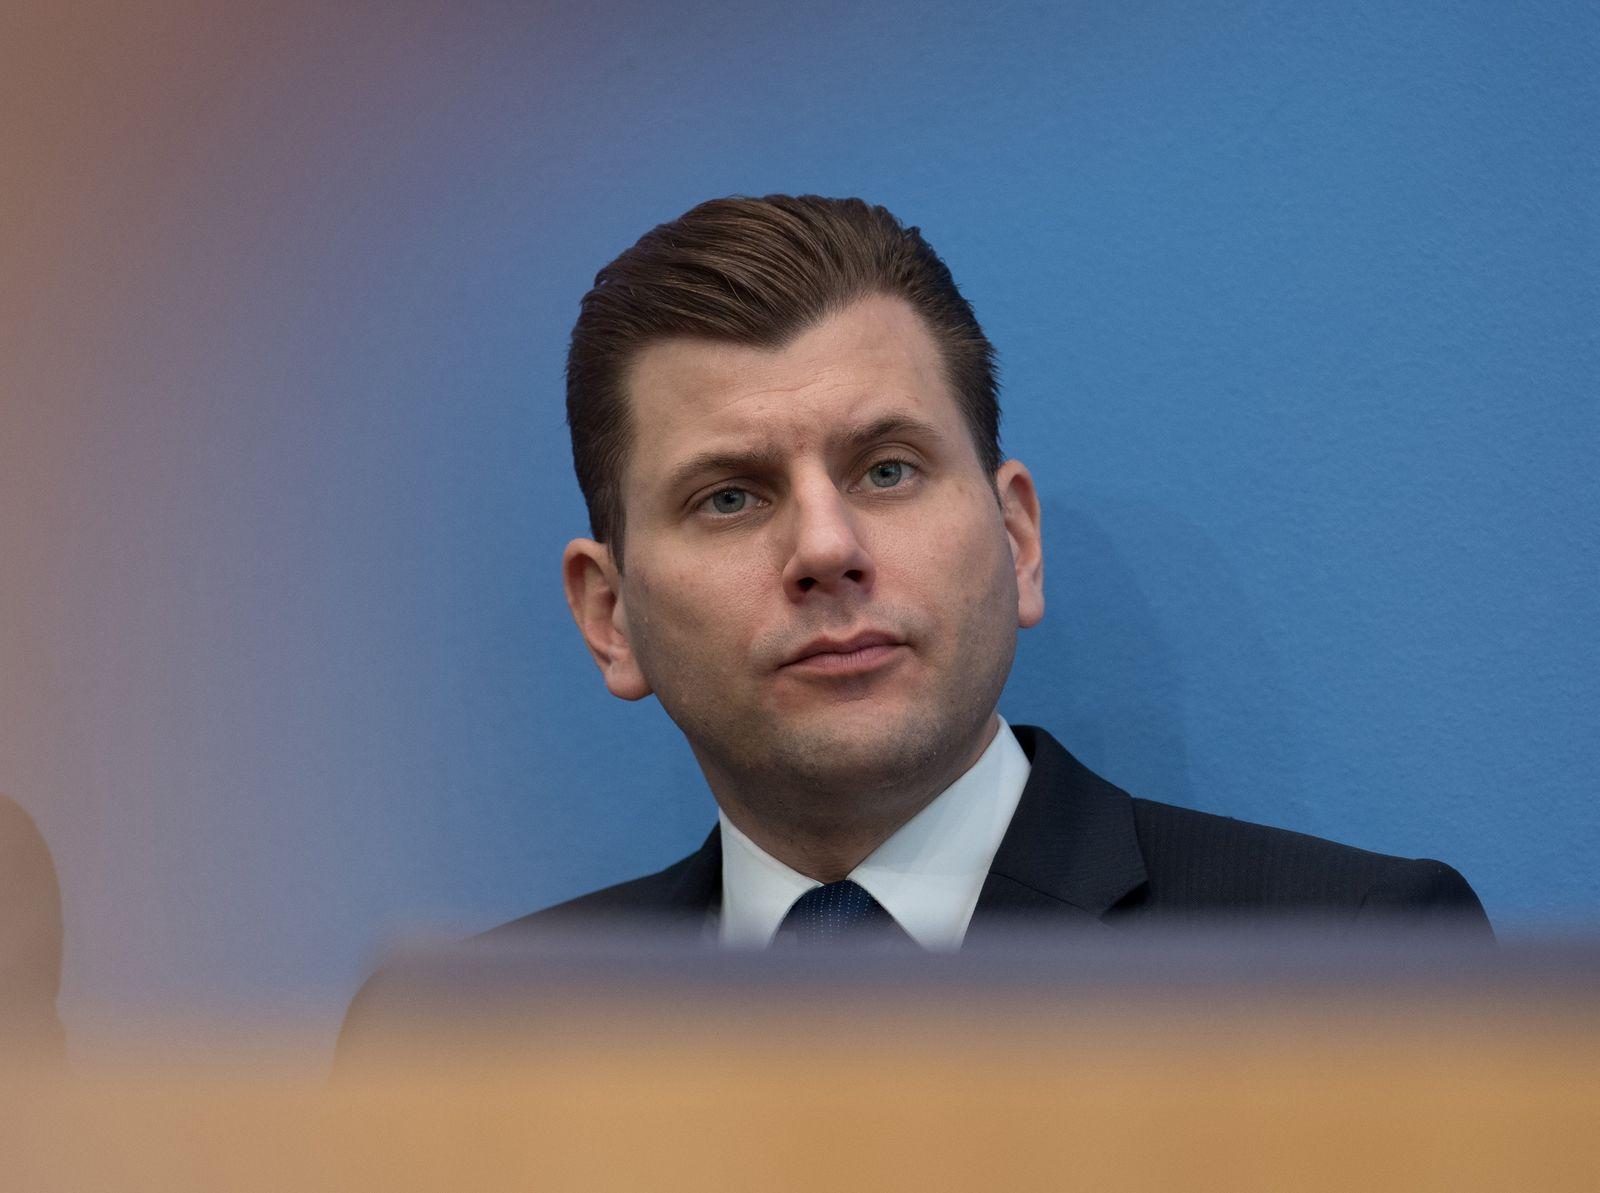 AfD-Bundestagsfraktion stellt Pressesprecher Lüth frei